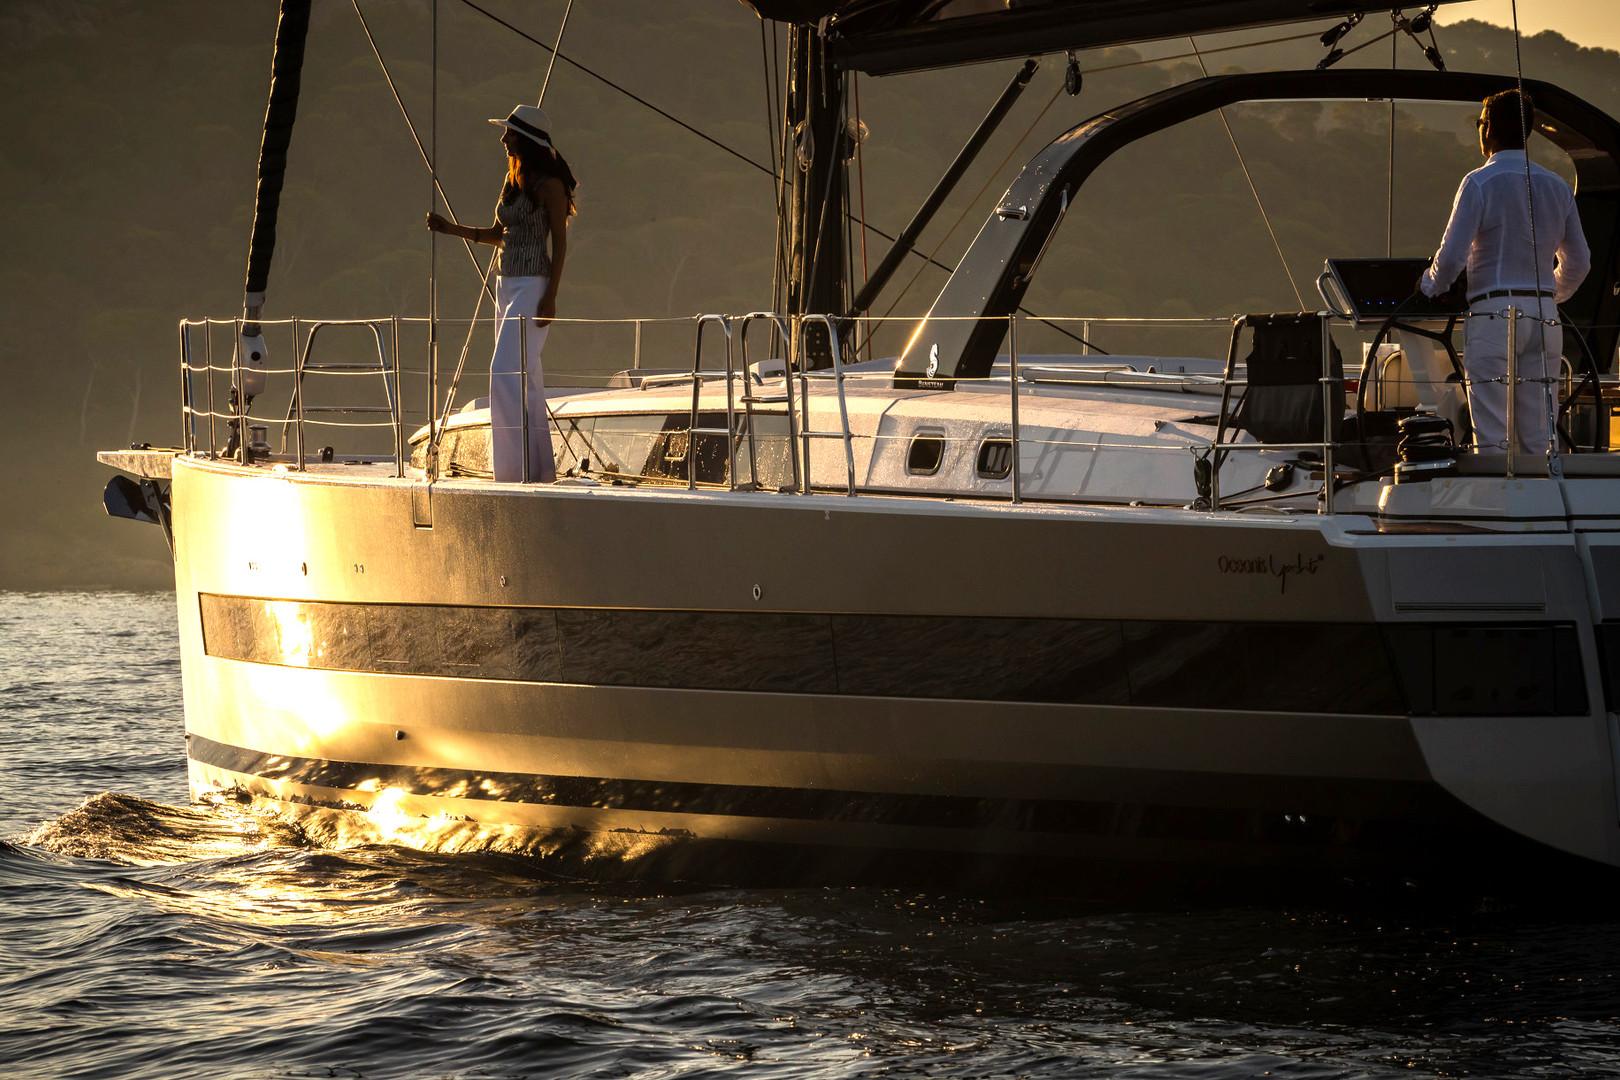 gc_Oceanis_Yacht_62_2016_4200.JPG-1832px